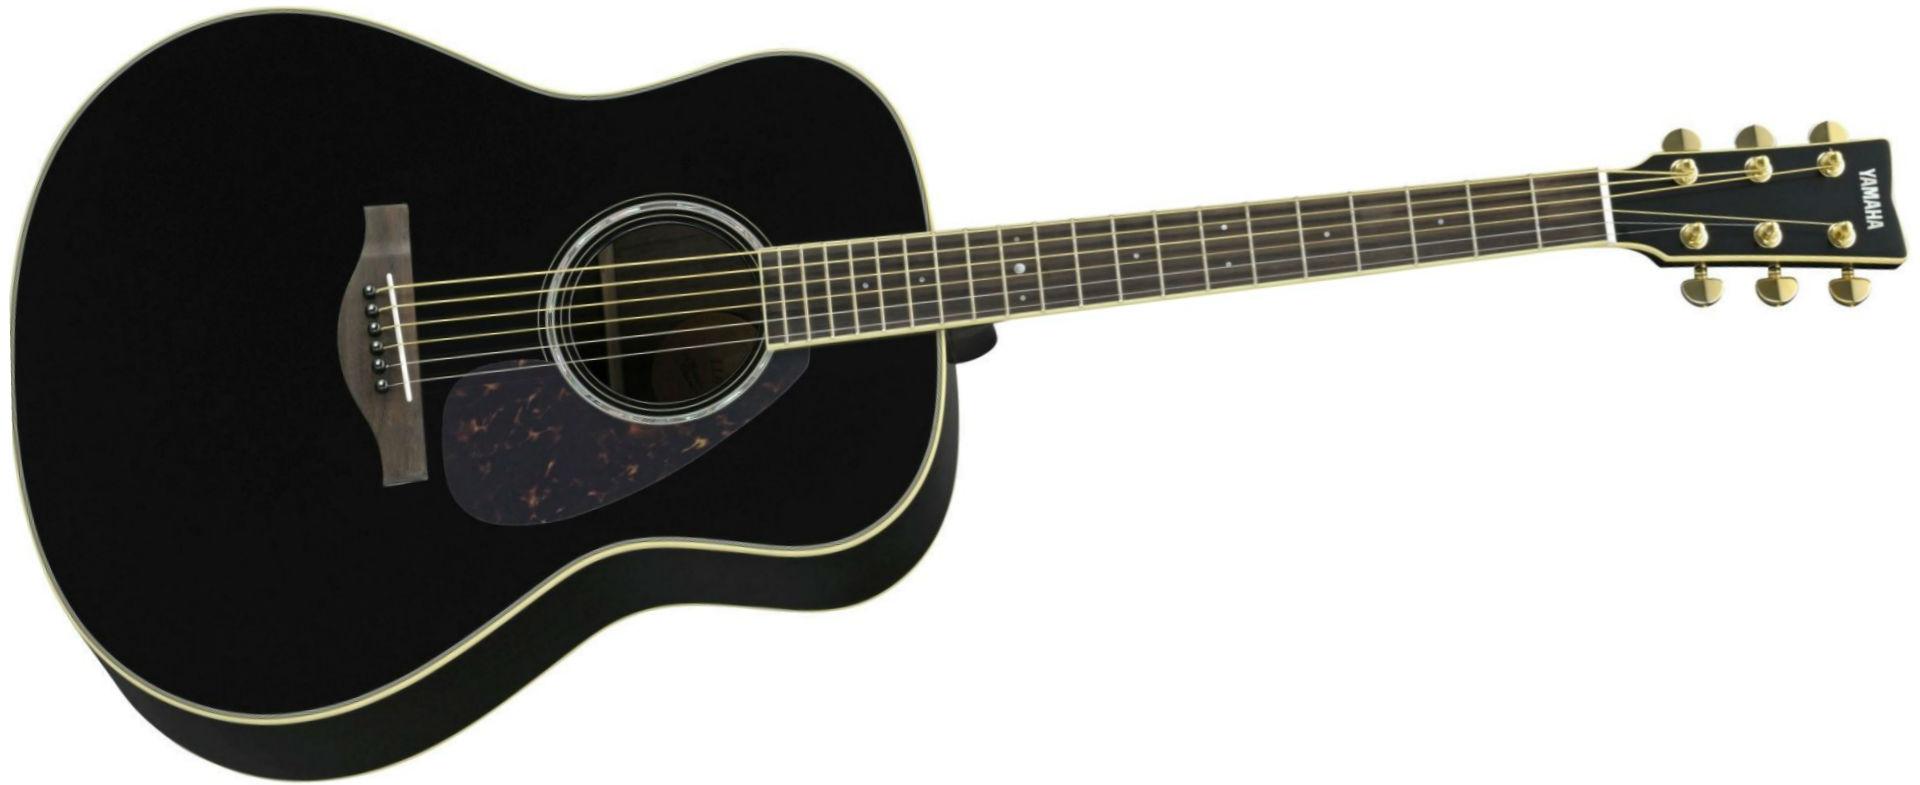 Schemi Elettrici Effetti Per Chitarra : Yamaha ll are black gino strumenti musicali